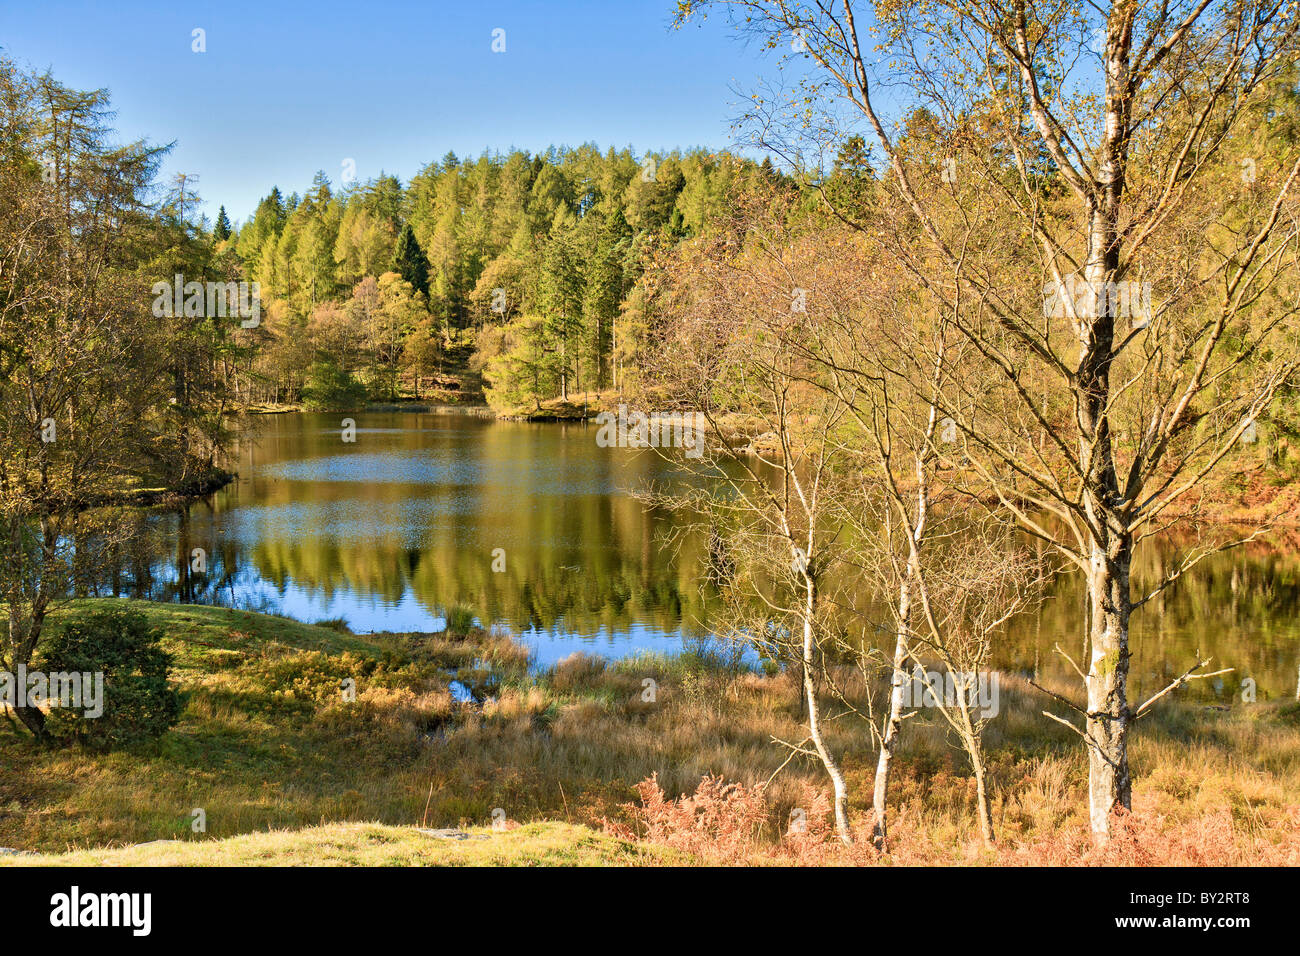 UK Cumbria Tarn Hows - Stock Image